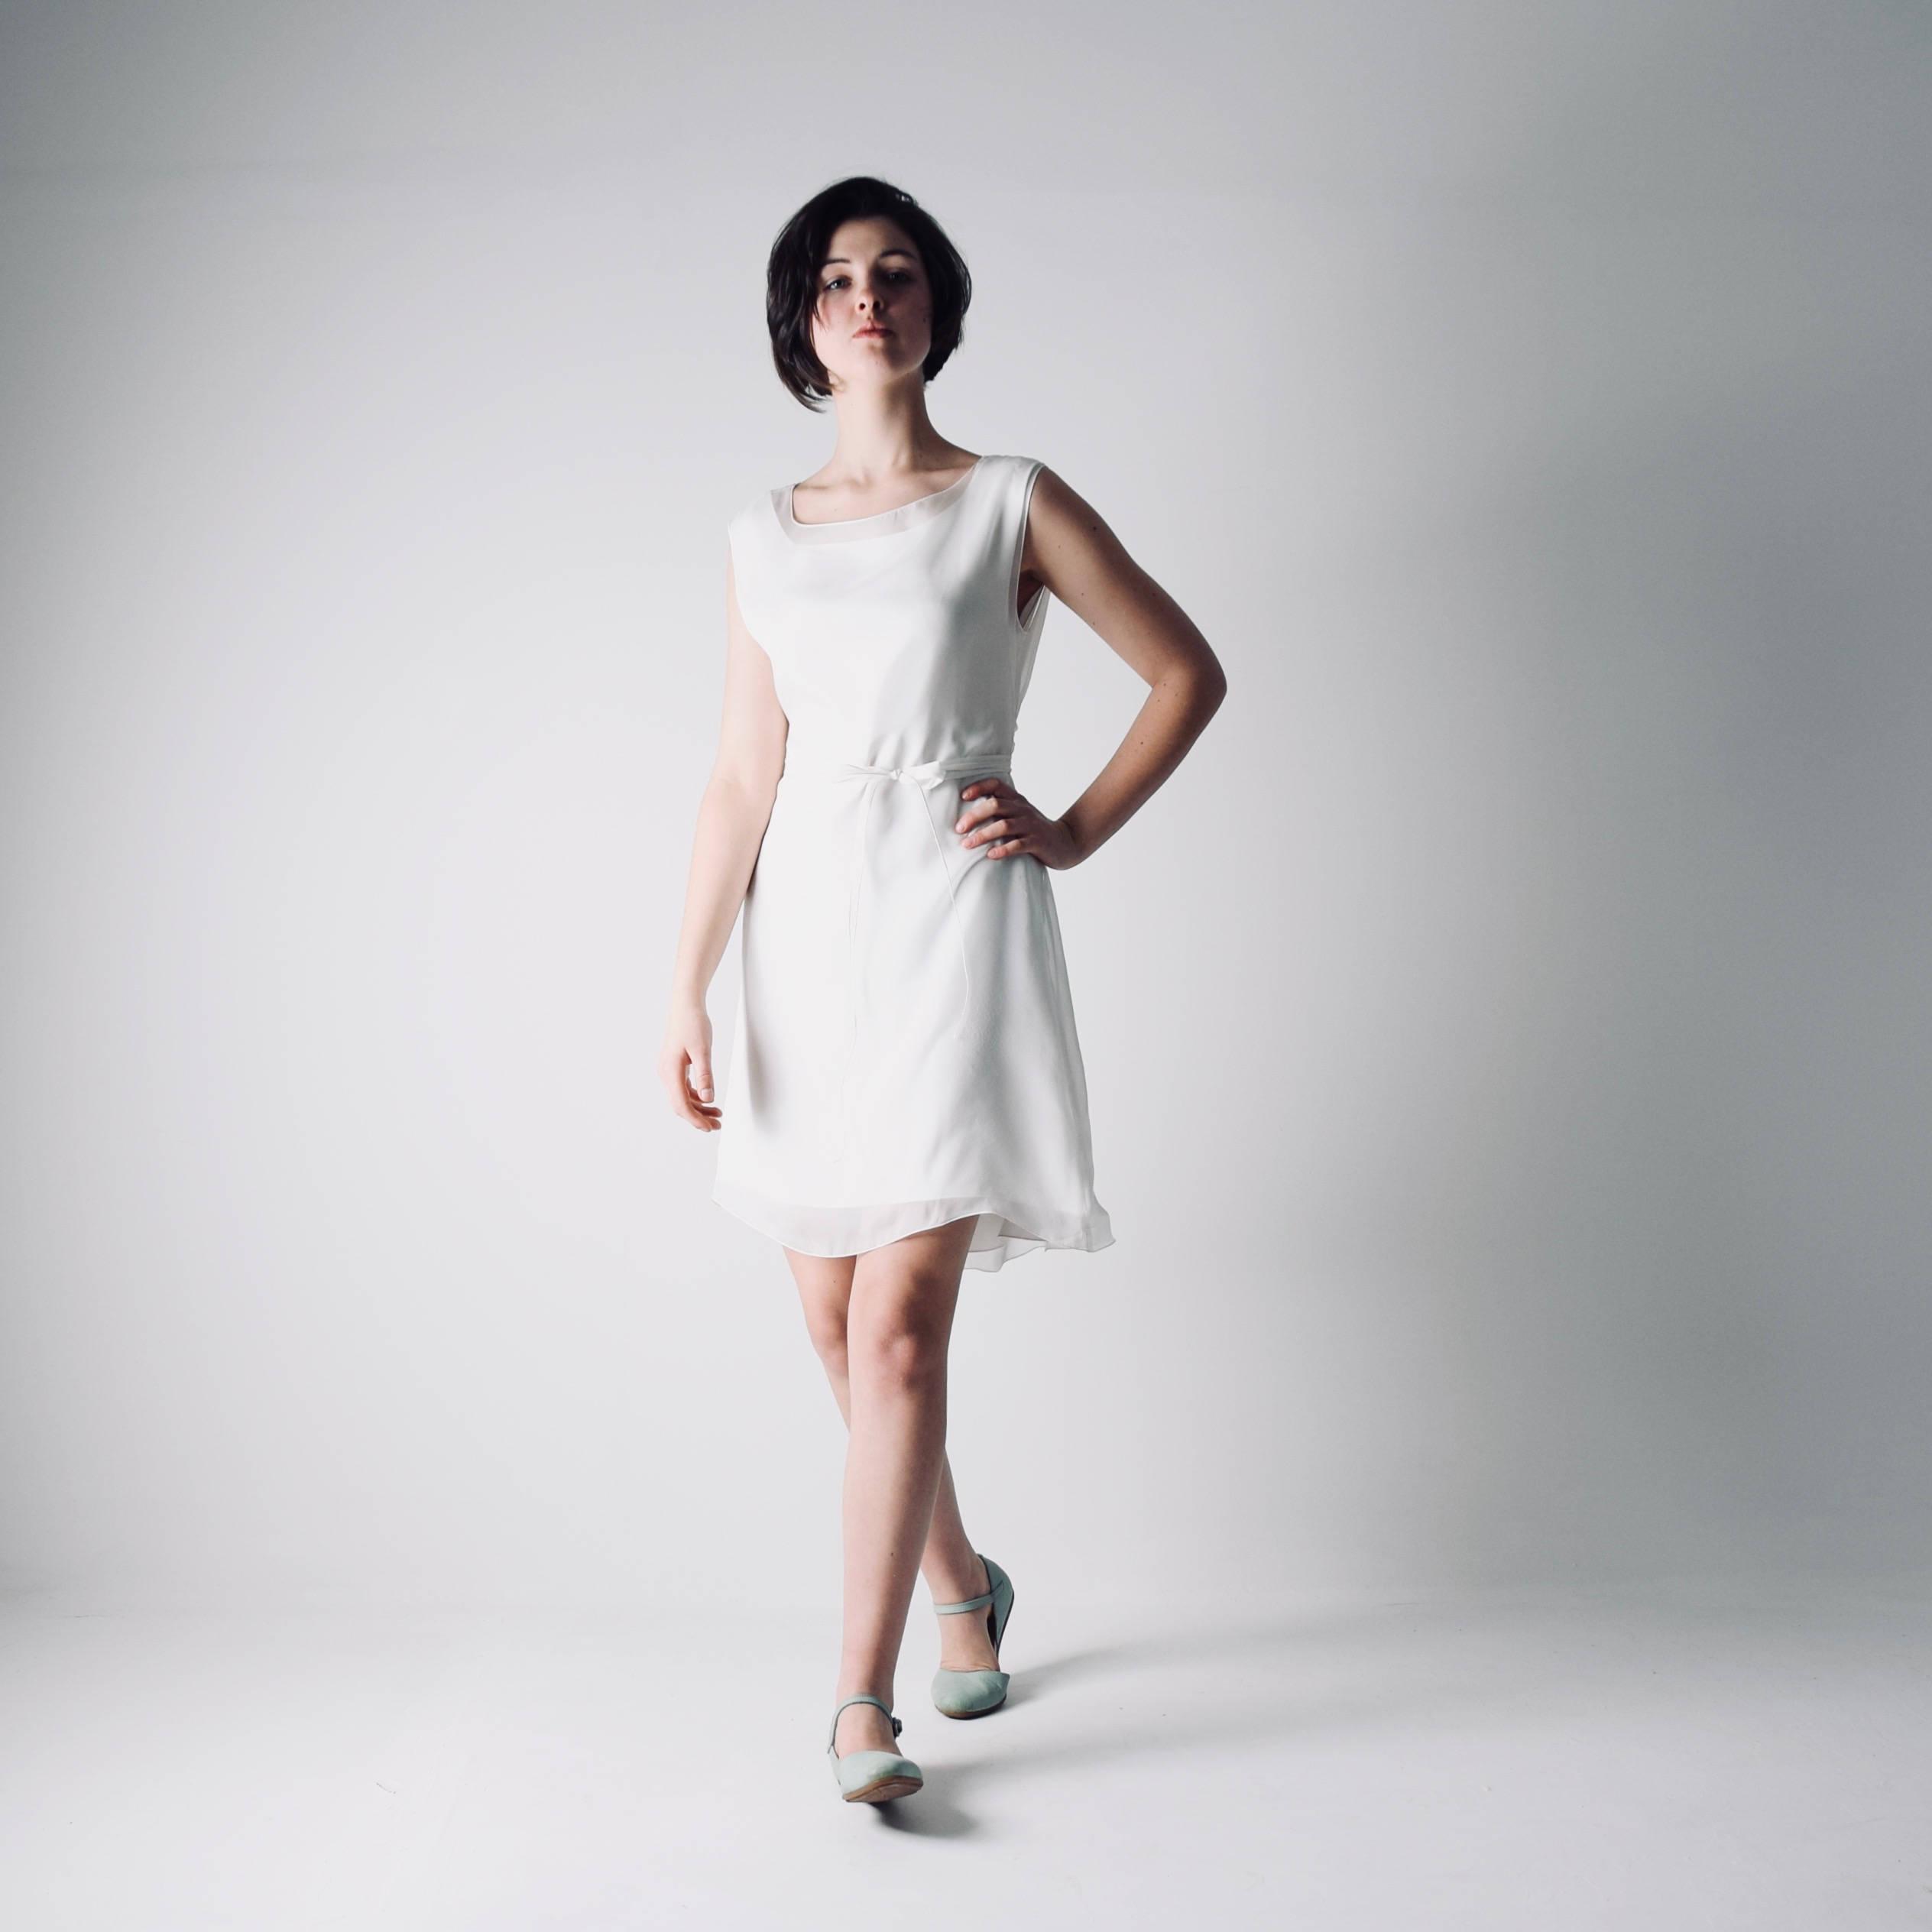 Short Tunic Wedding Dress - Larimeloom Handmade Clothing